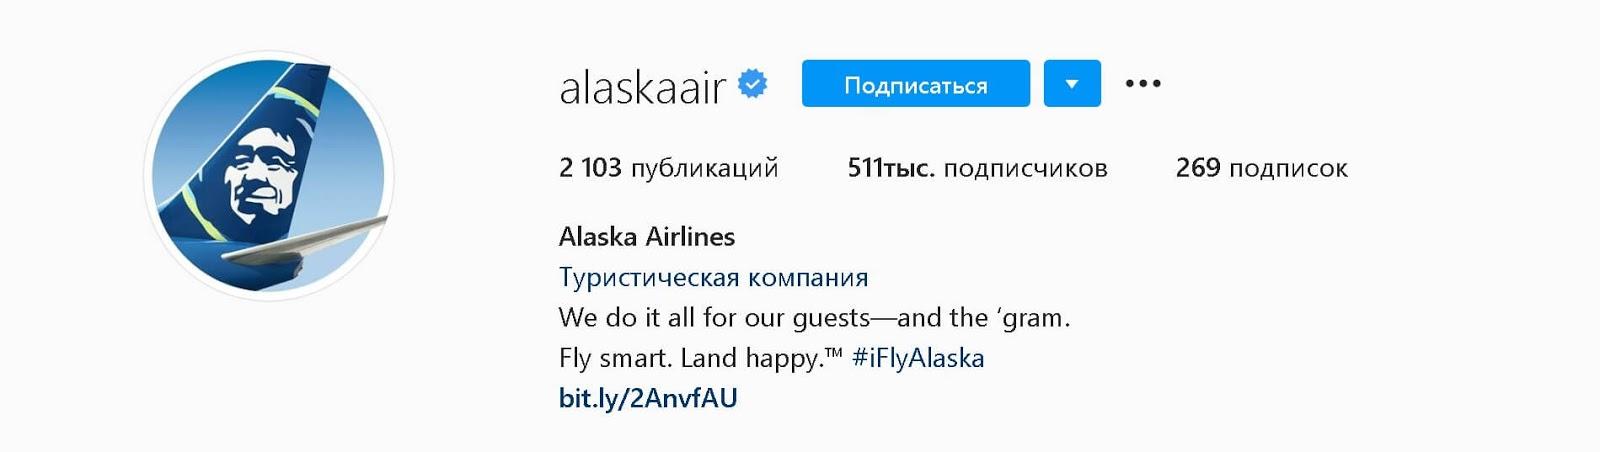 instagram-bios-alaska-airlines